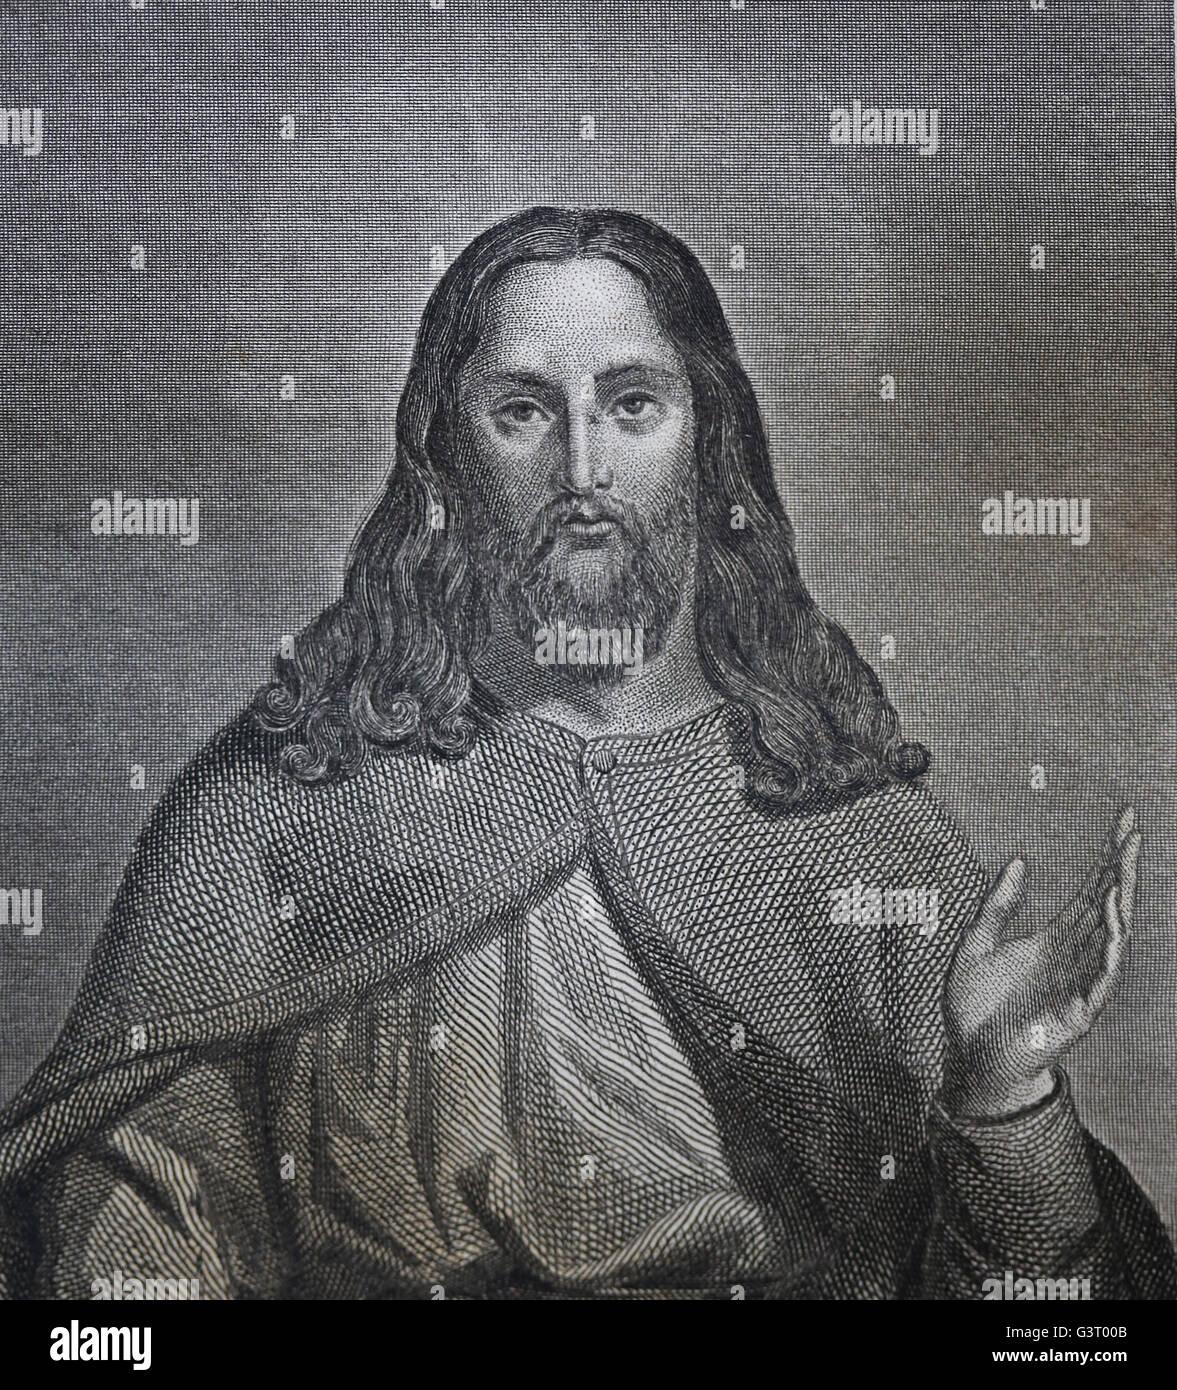 Christ. Portrait. Engraving, 19th century. - Stock Image